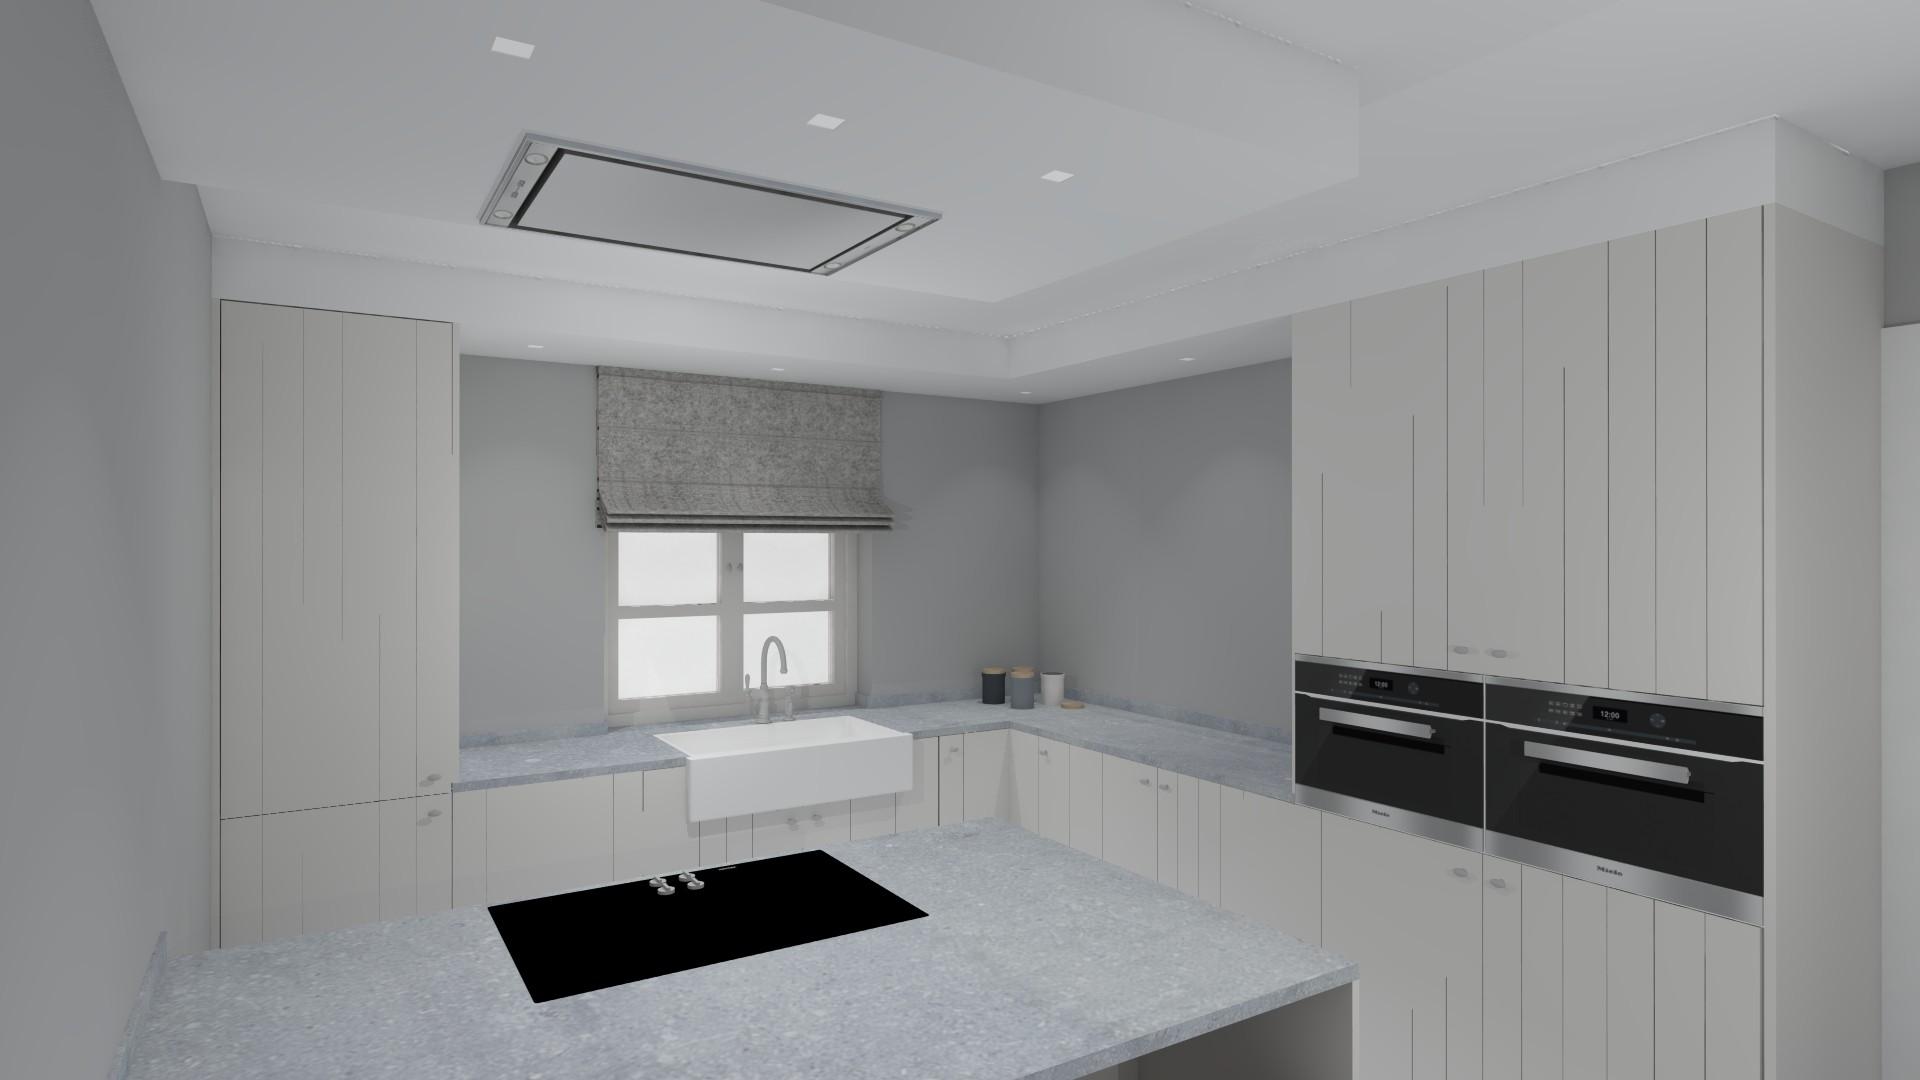 interieurarchitectuur renovatie keuken